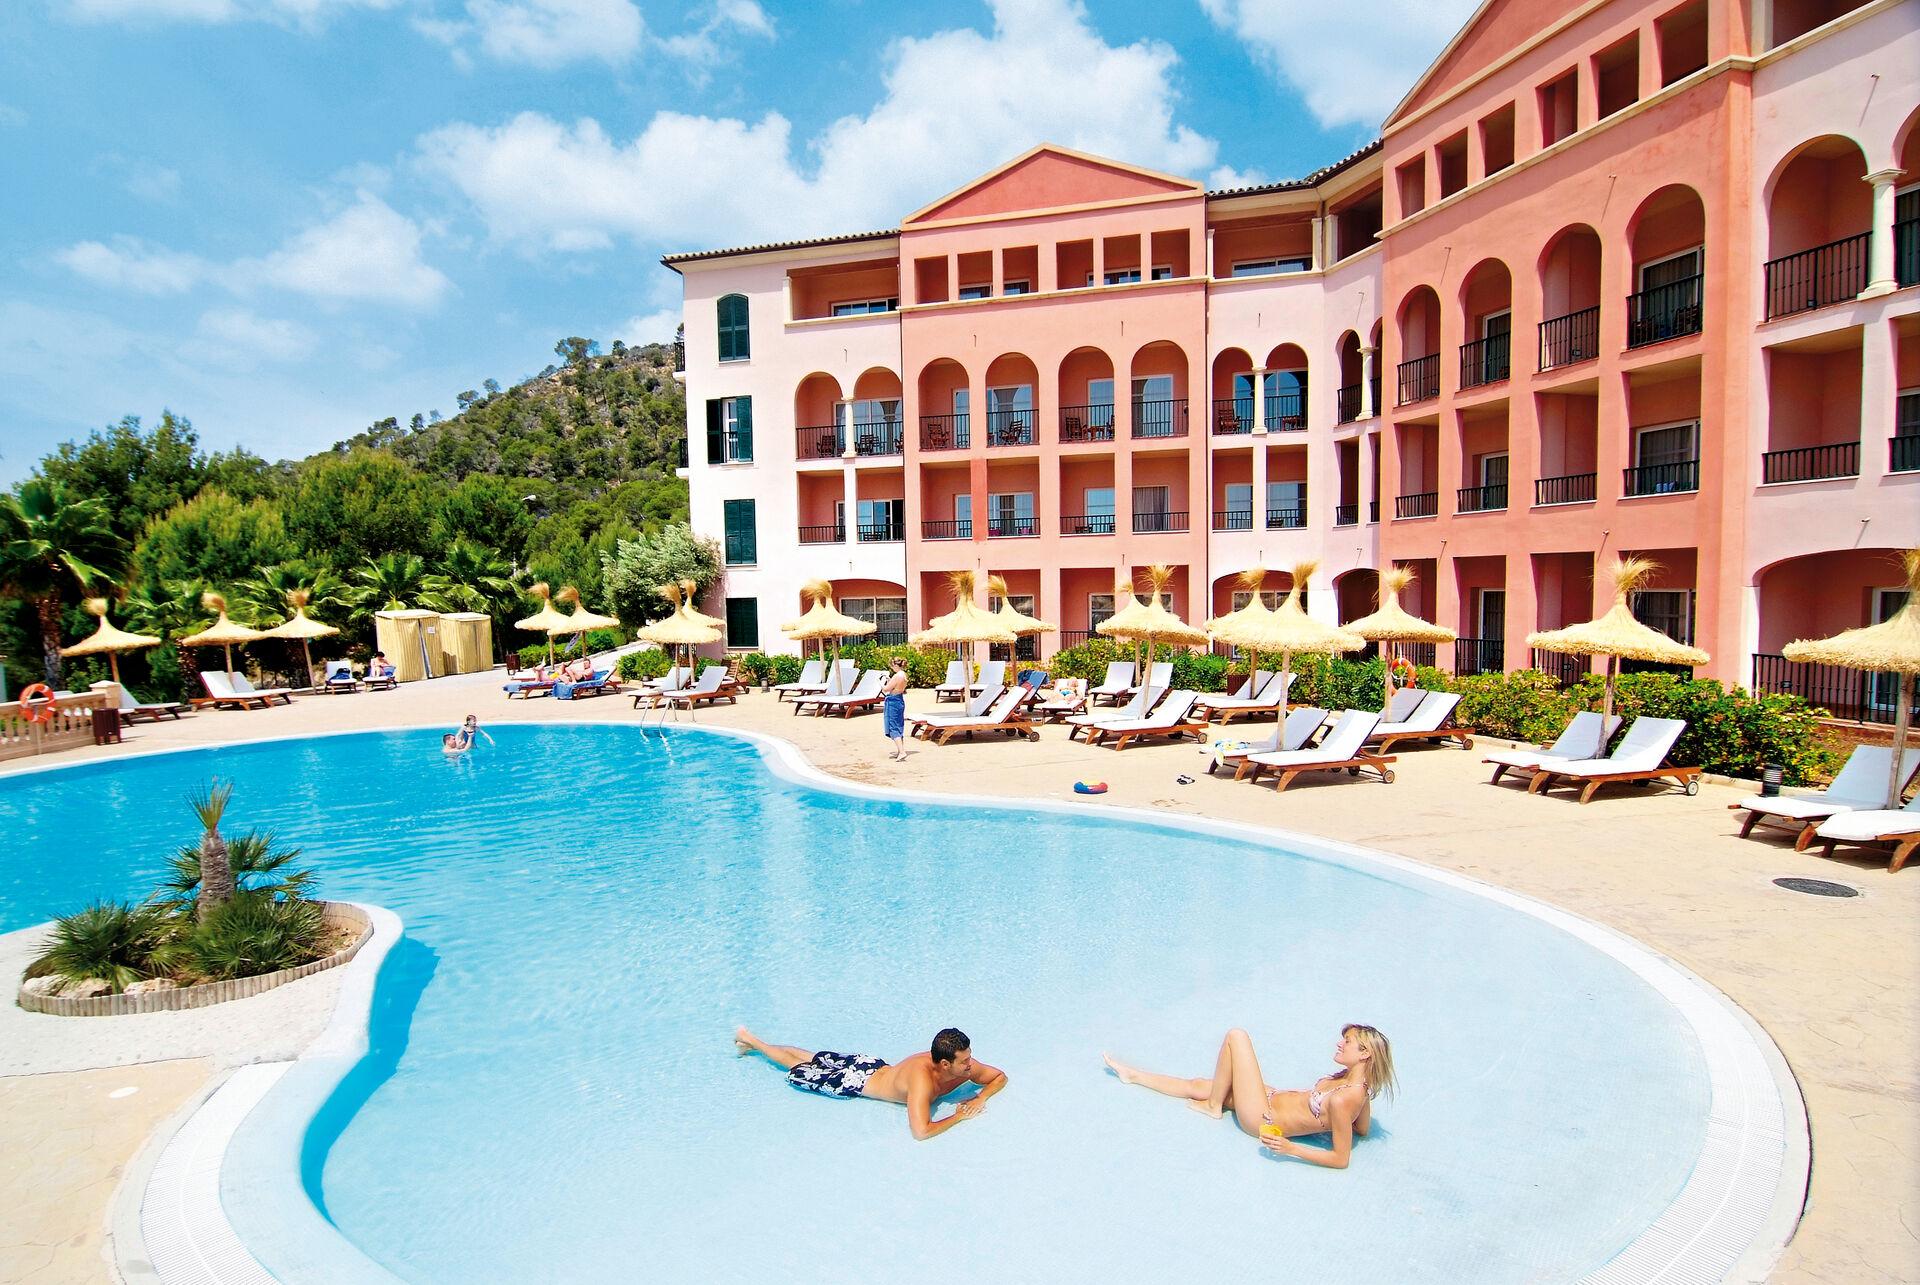 Hotel Don Antonio